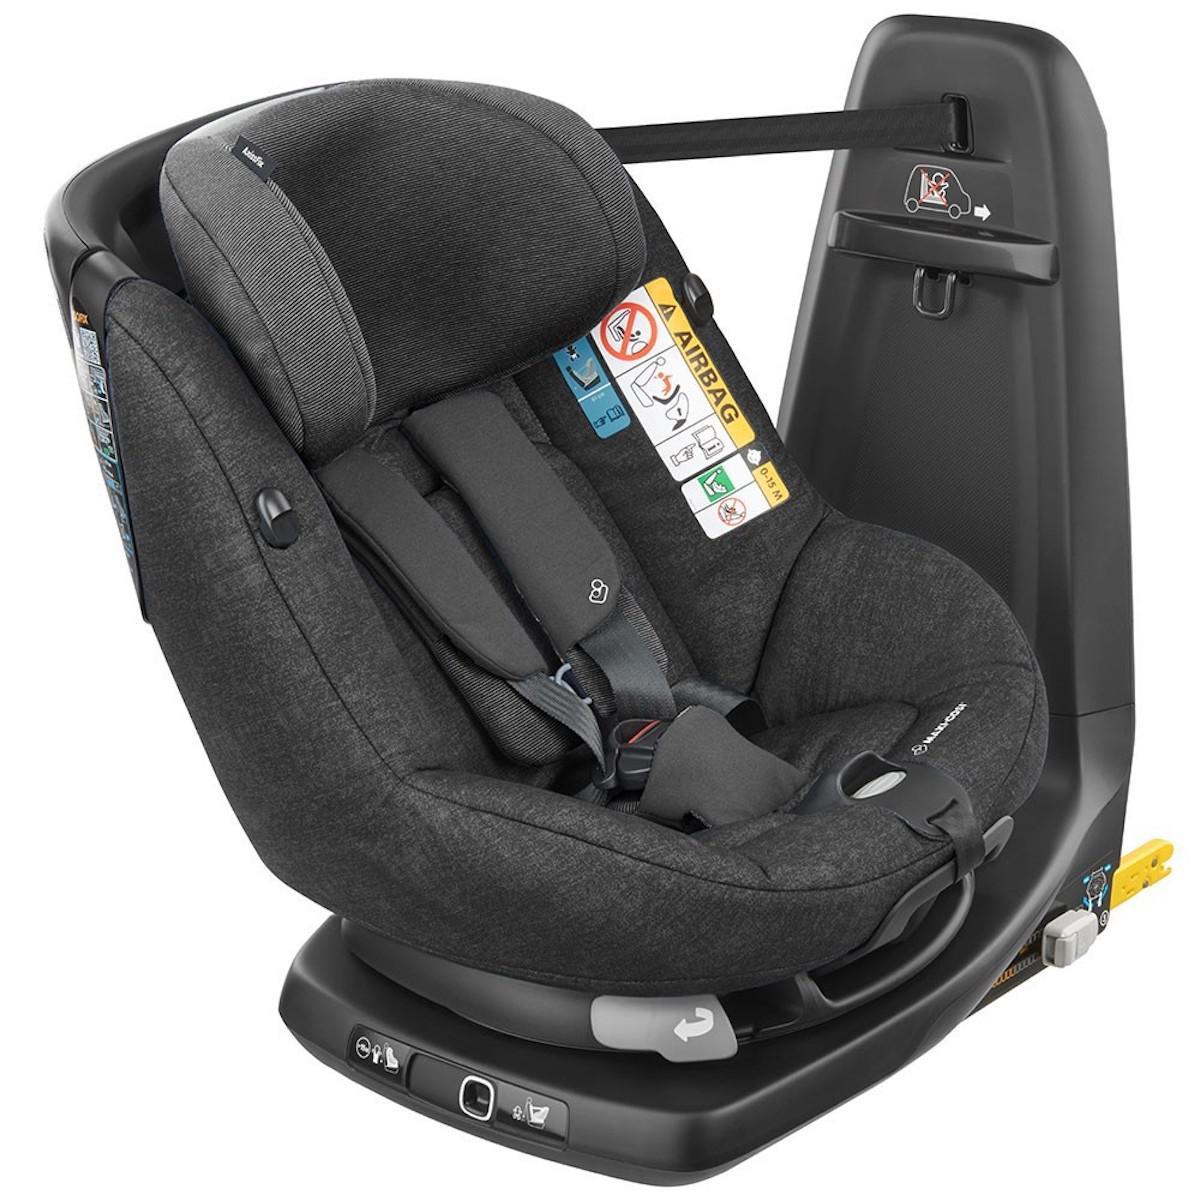 Siège auto bébé groupe 0+/1 AXISSFIX Maxi-Cosi nomad black